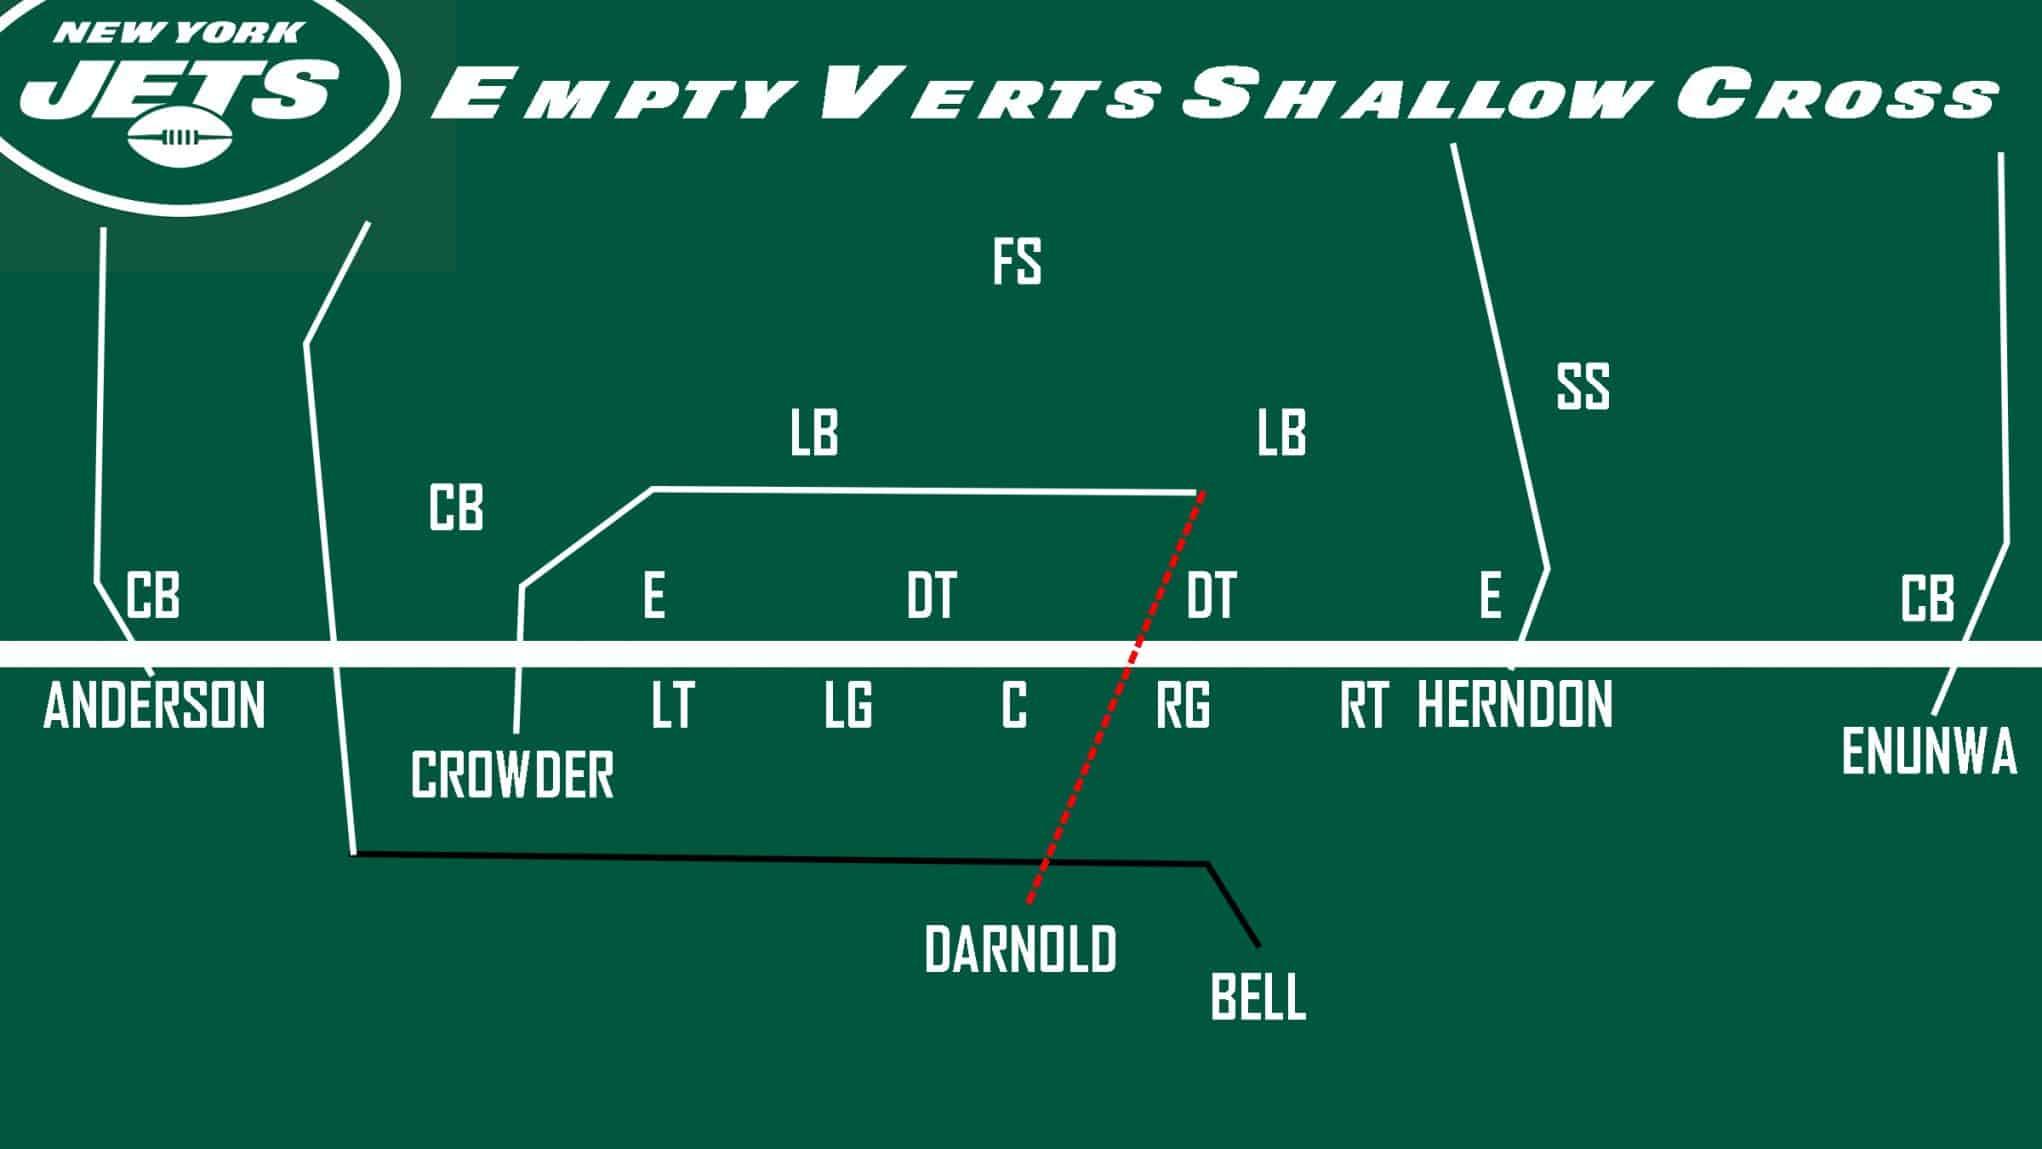 Jets Verts Shallow Cross